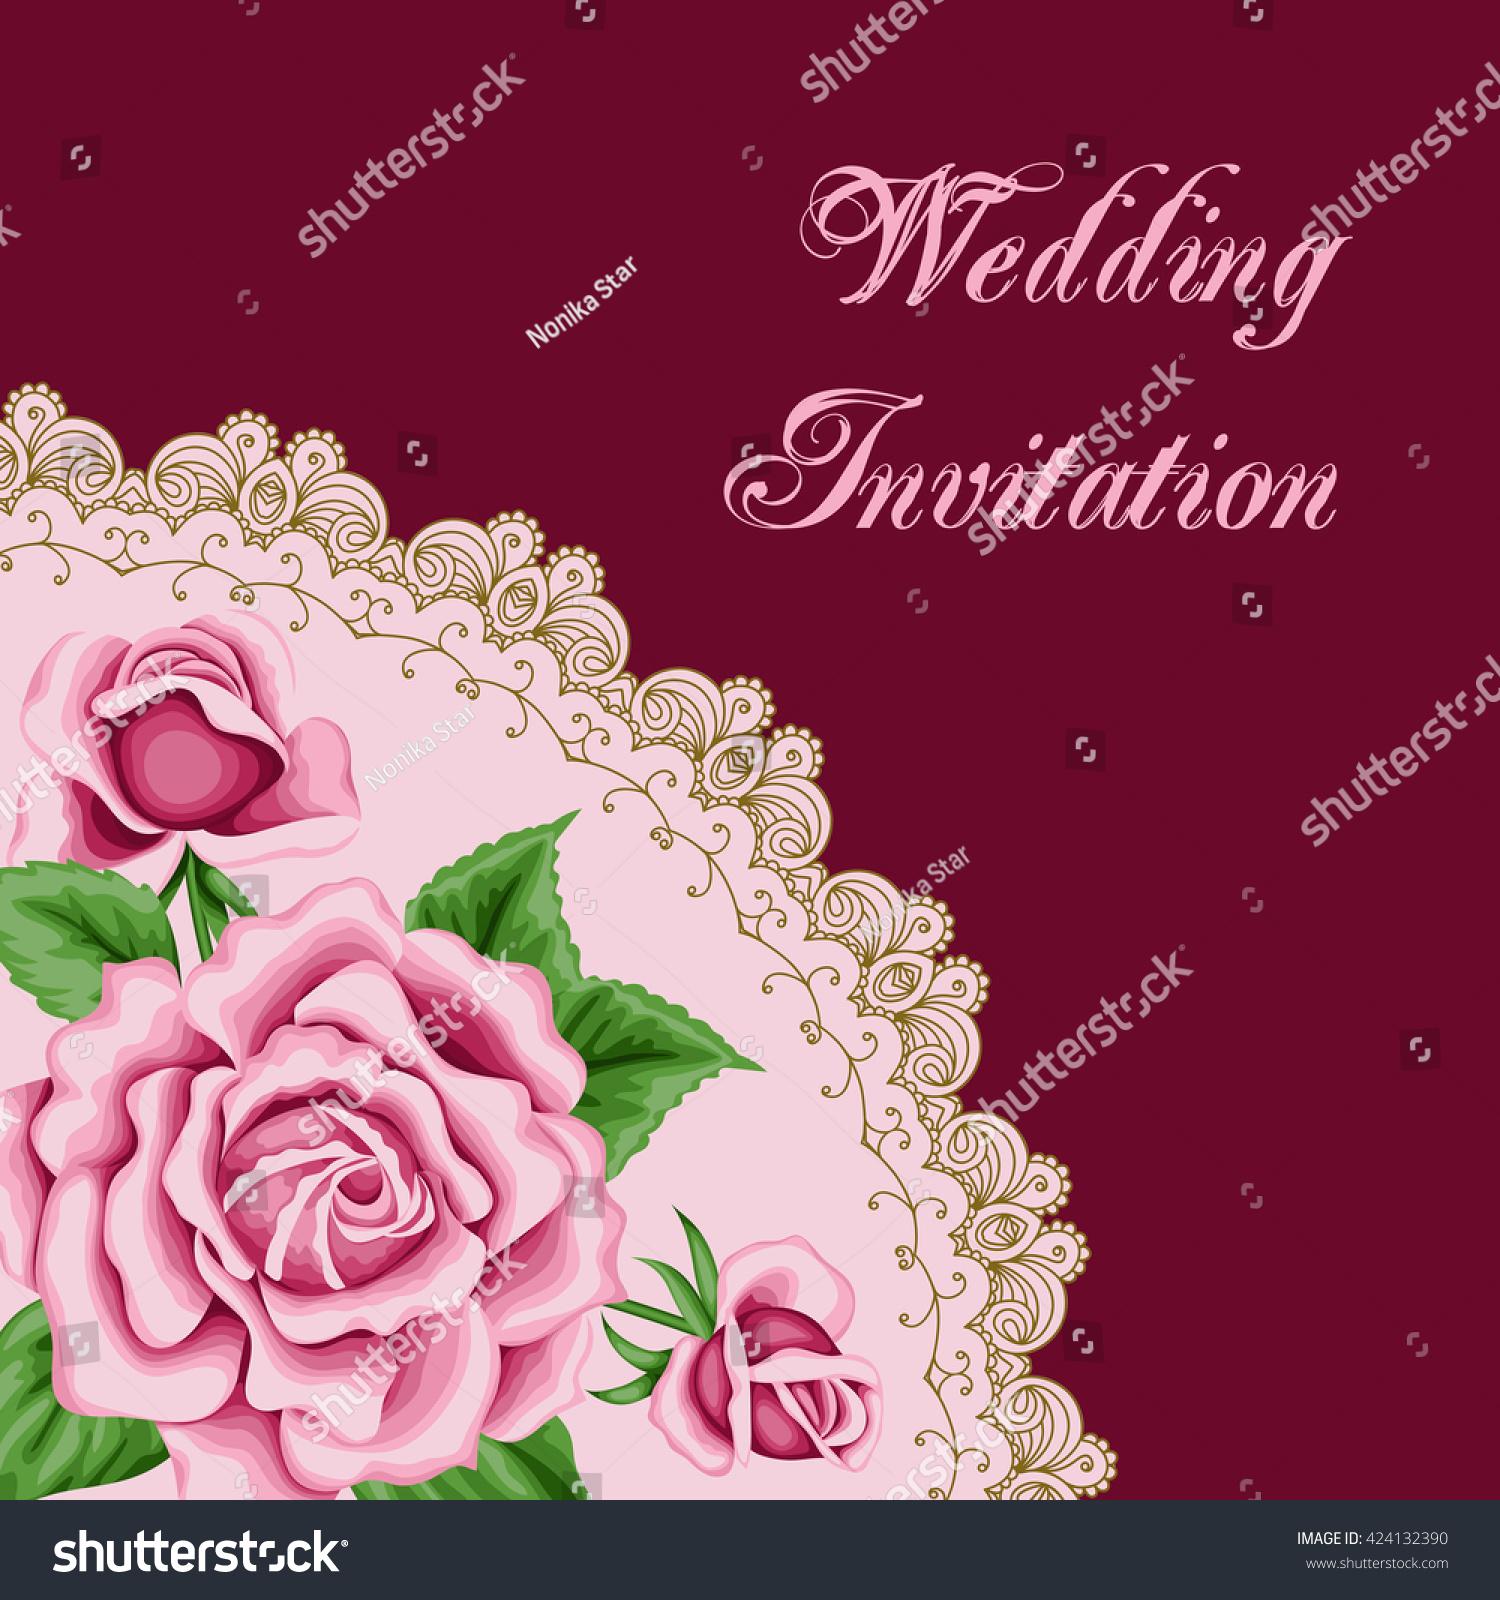 Vintage Wedding Invitation Pink Roses Lace Stock Illustration ...